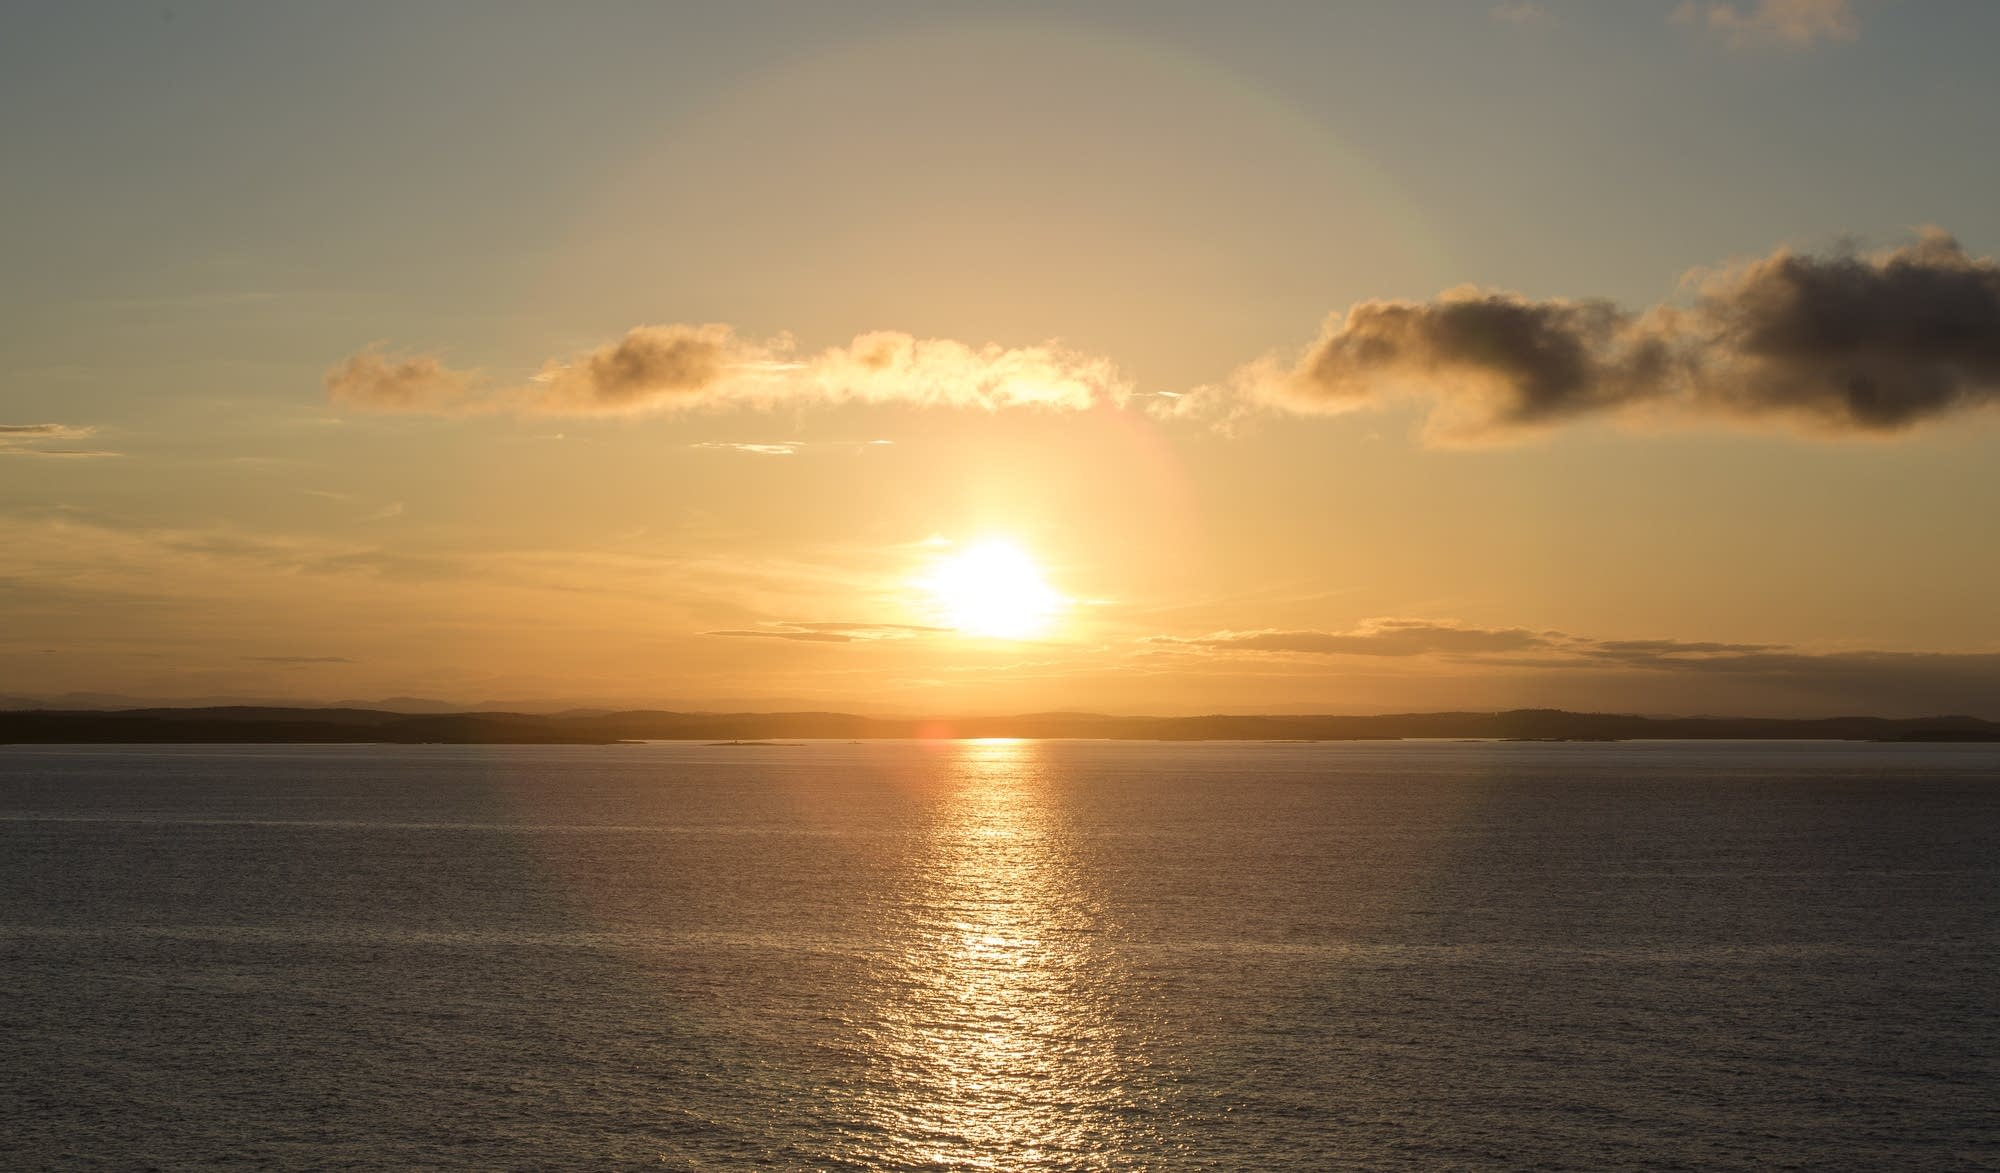 Oslo - 49 - sunset at sea